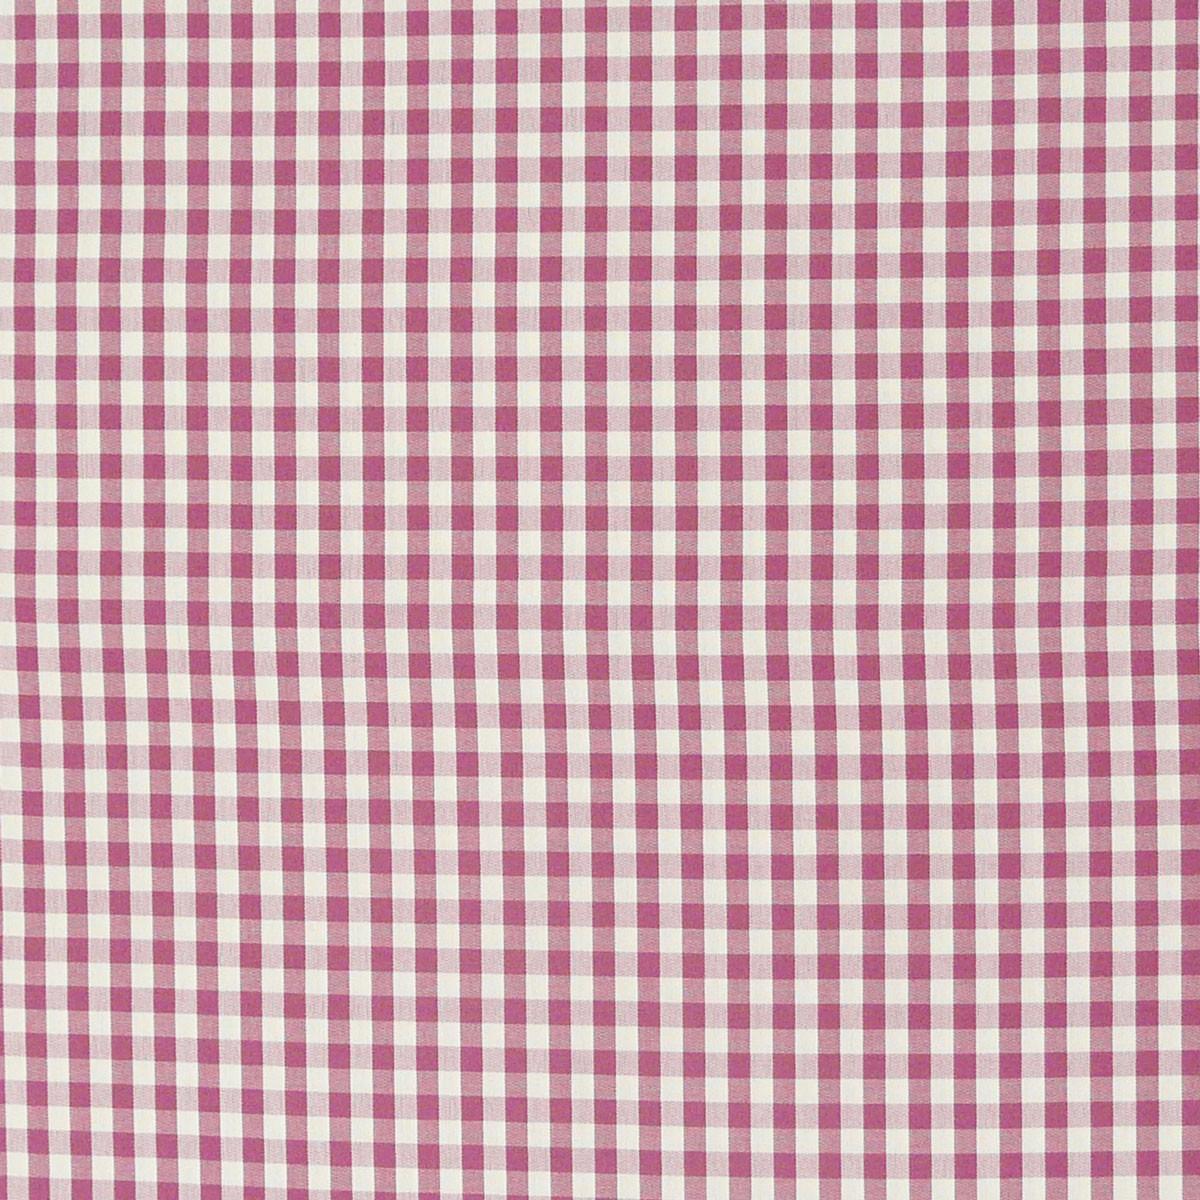 Gardinenstoff Stoff Dekostoff Meterware kariert rosa beere weiß Karo1cm